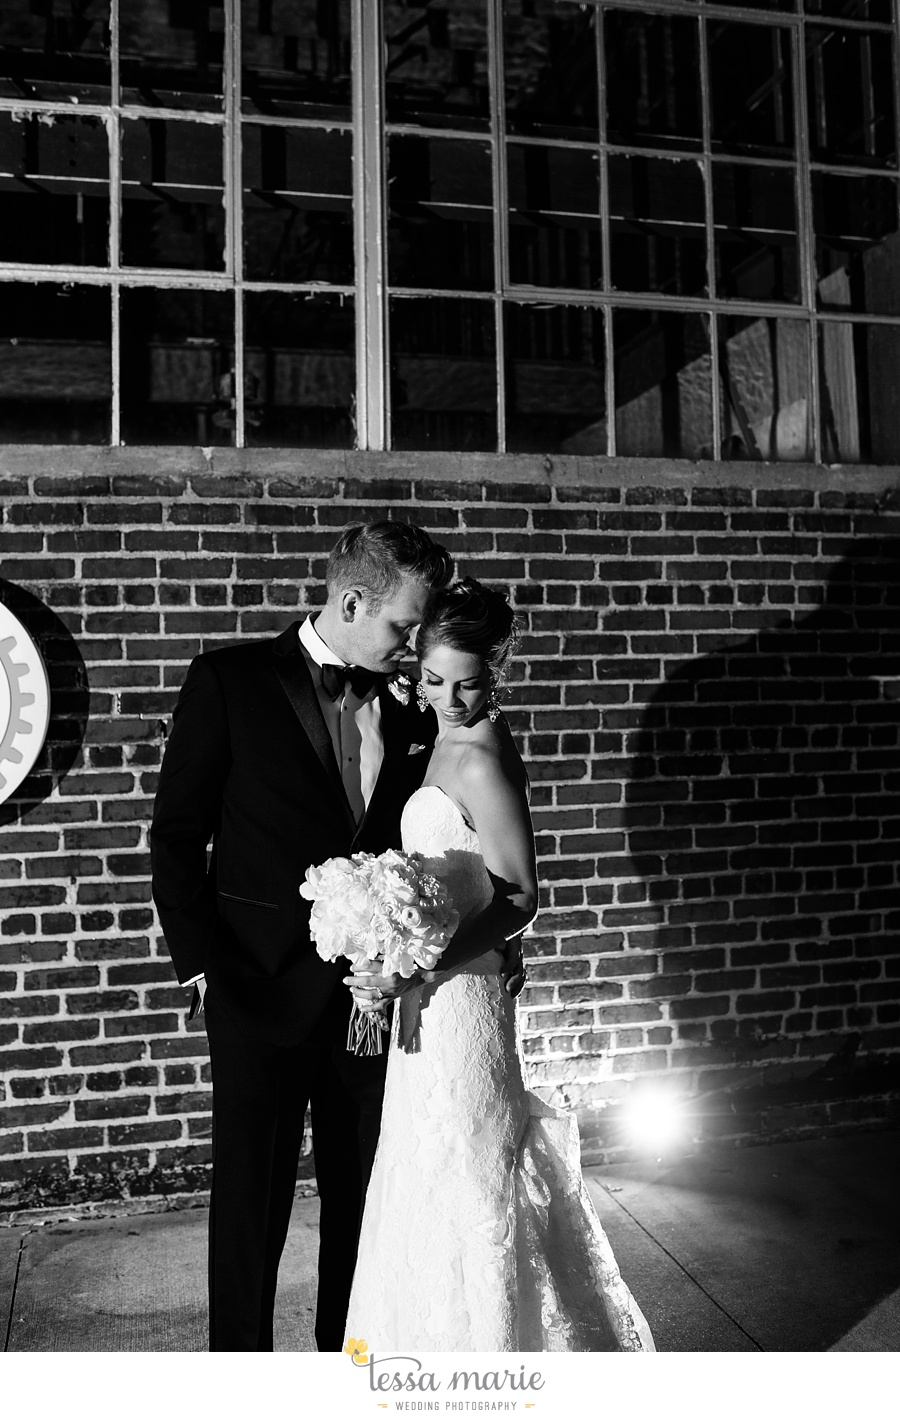 344_tessa_marie_weddings_emotional_moments_photography_king_low_wedding_sam_neil_best_atlanta_wedding_photographer